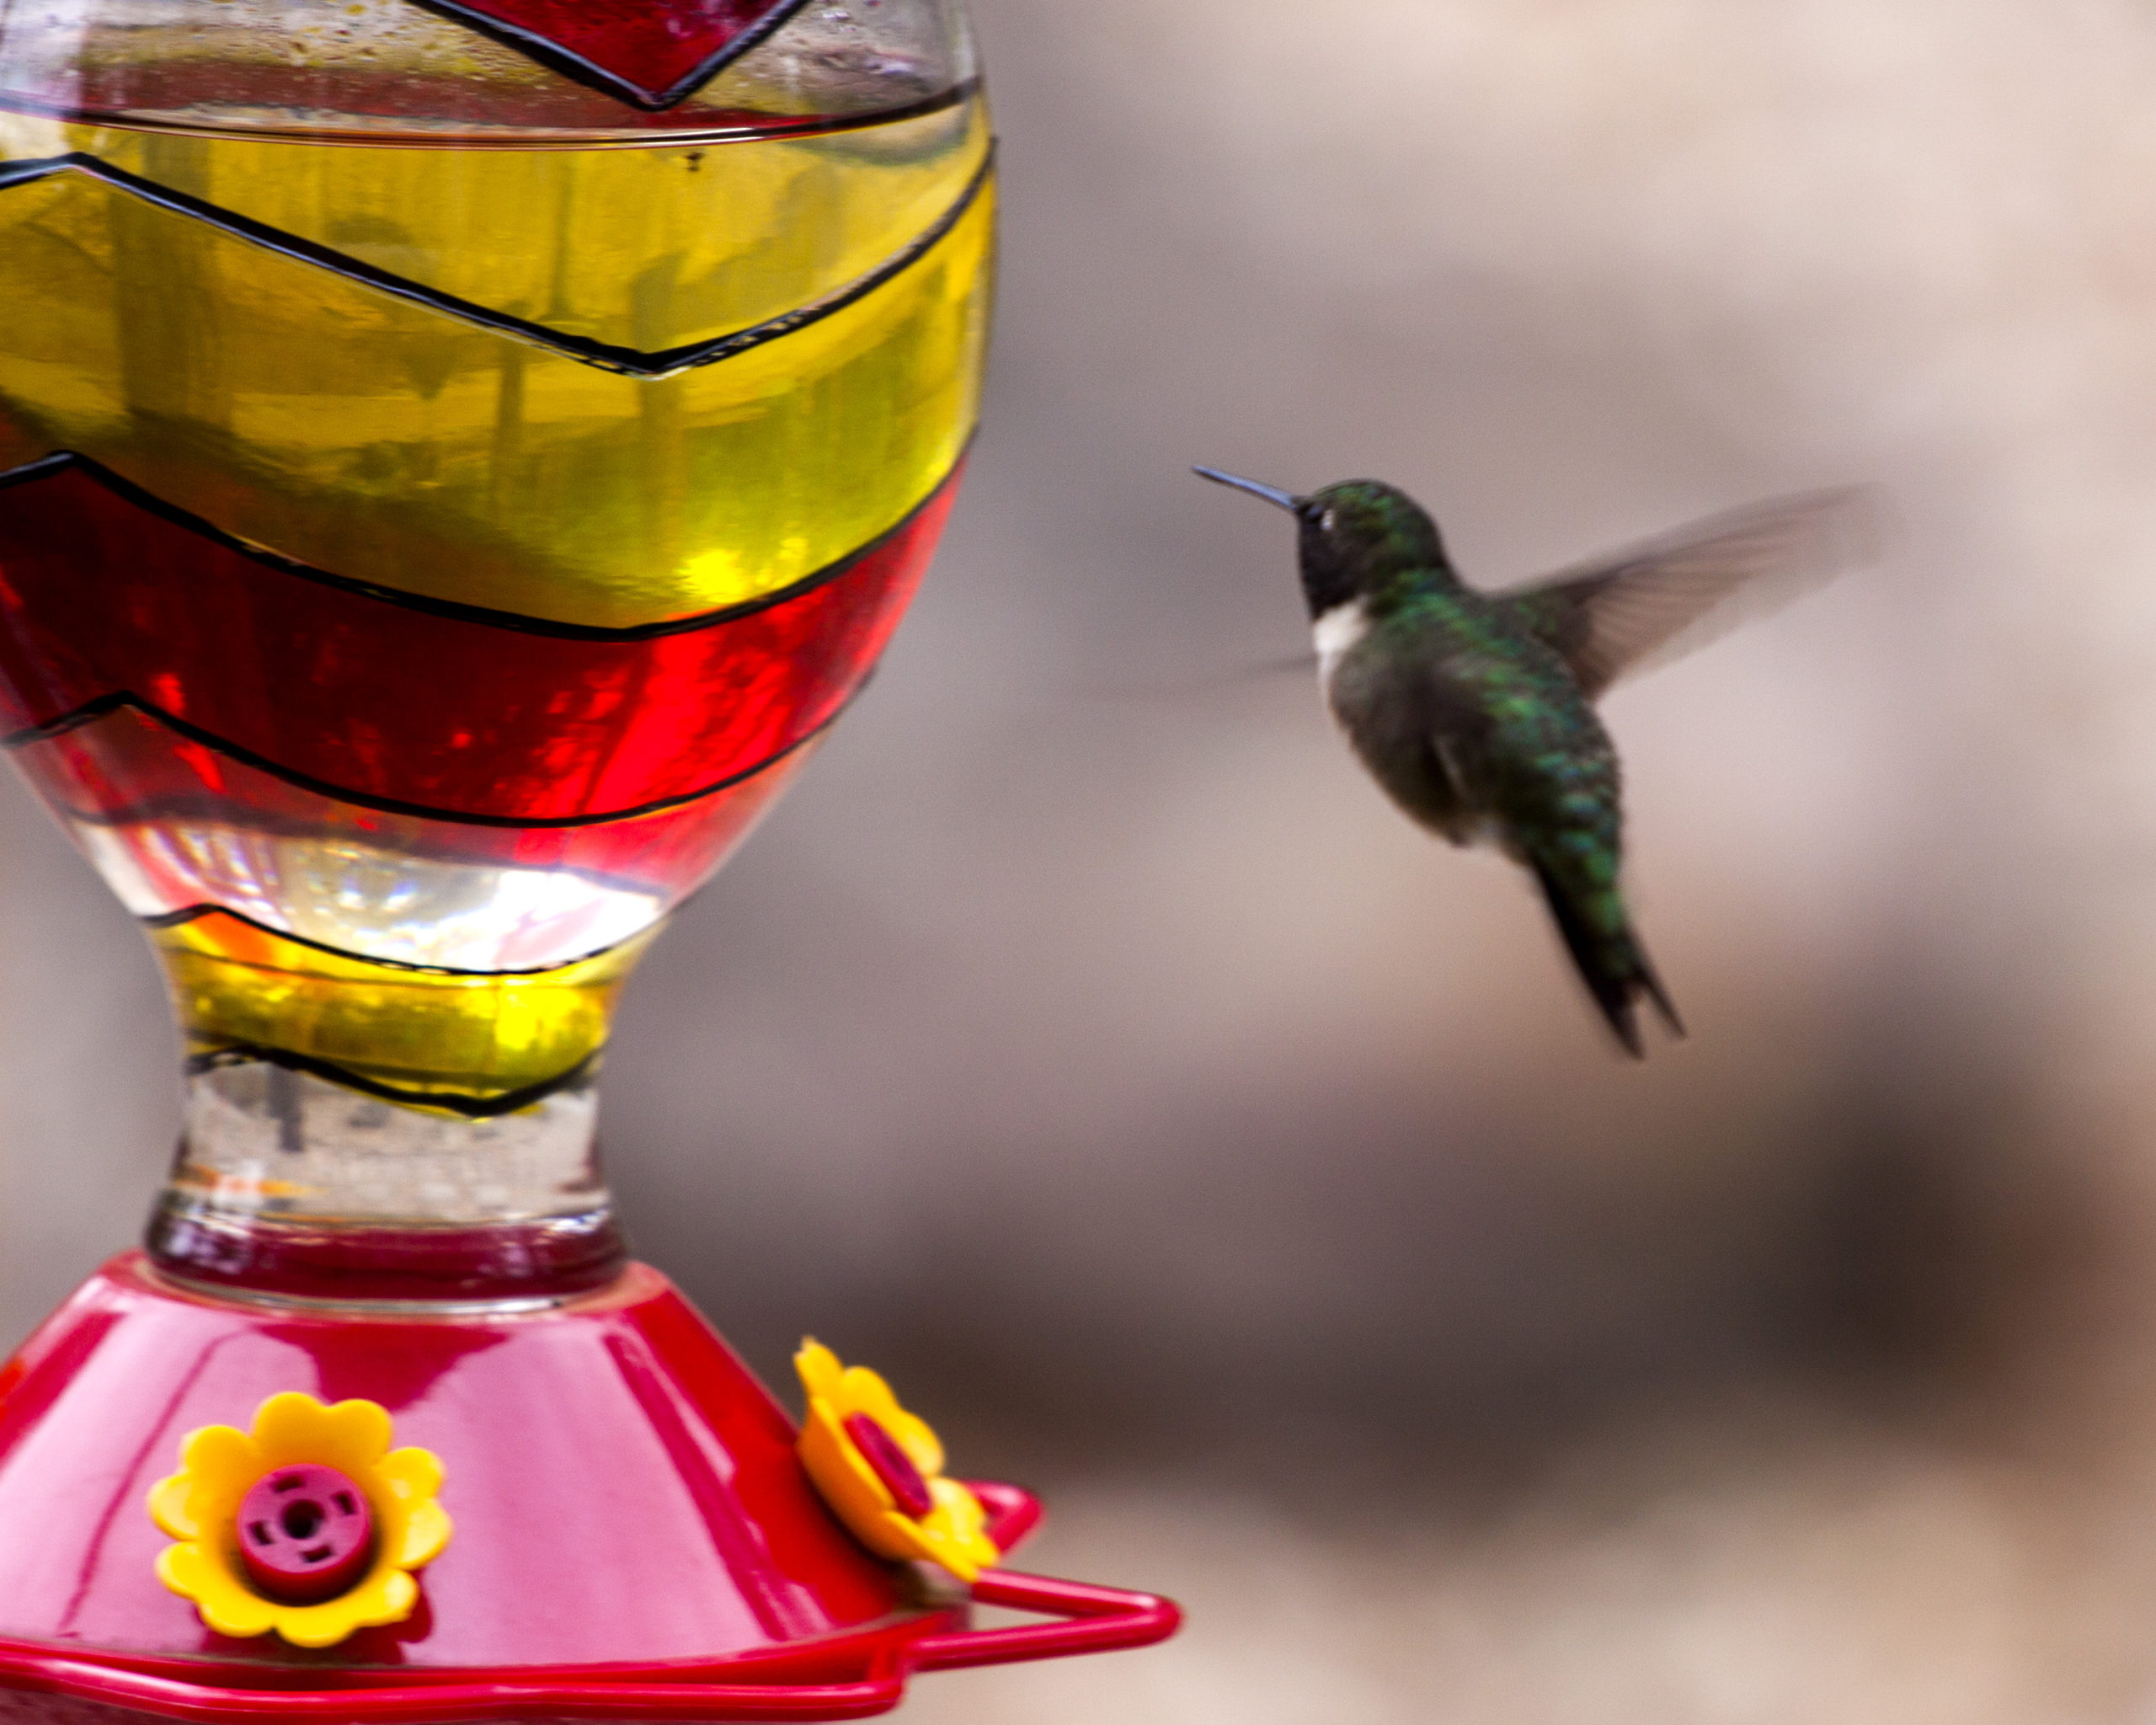 Image of hummingbird at feeder